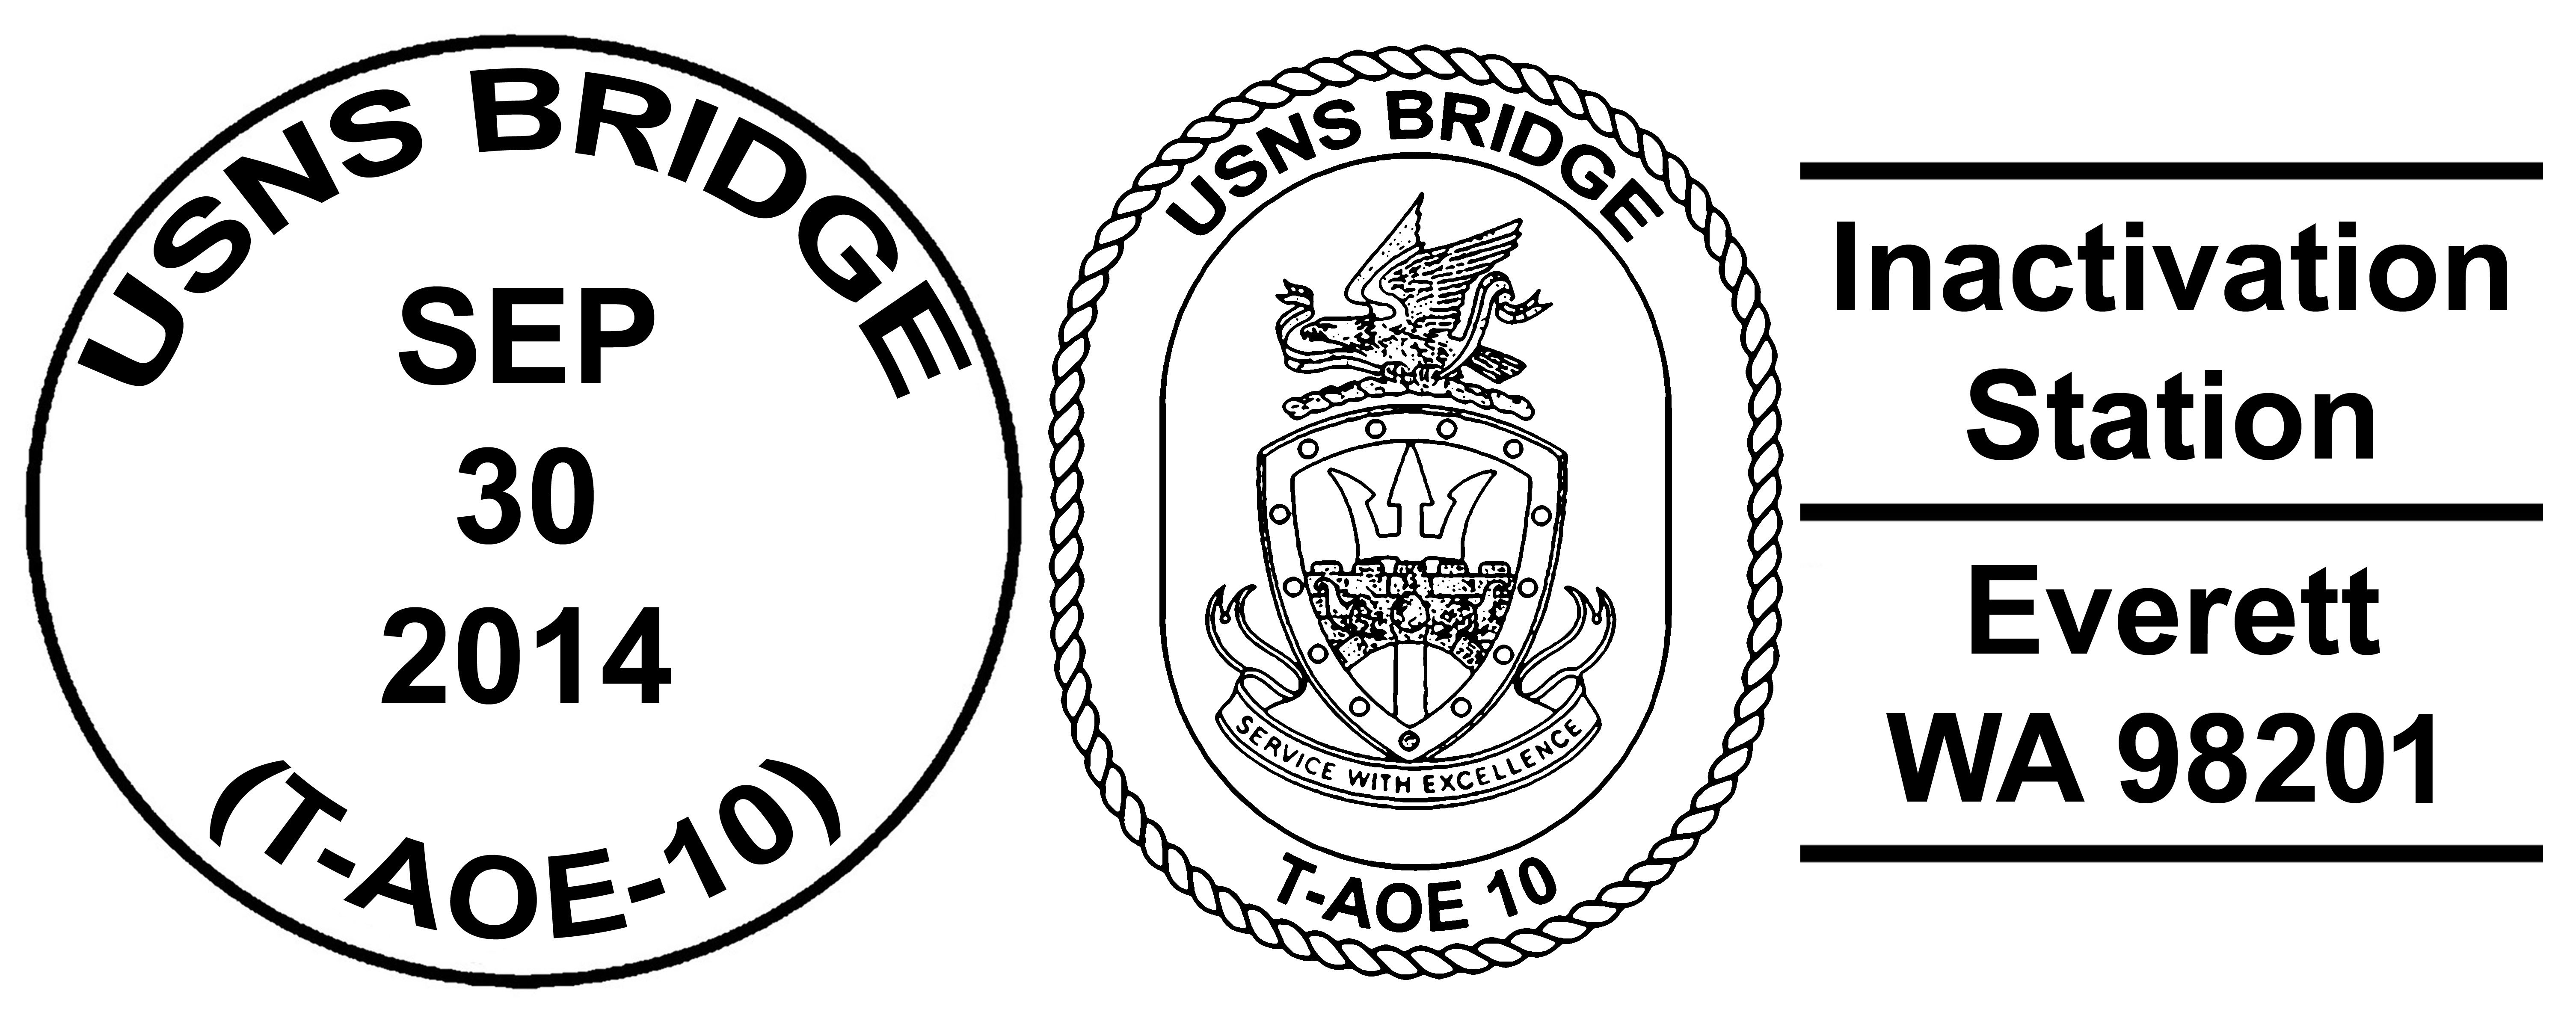 Sonderpoststempel USNS BRIDGE T-AOE 10 Inactivation Design: Wolfgang Hechler